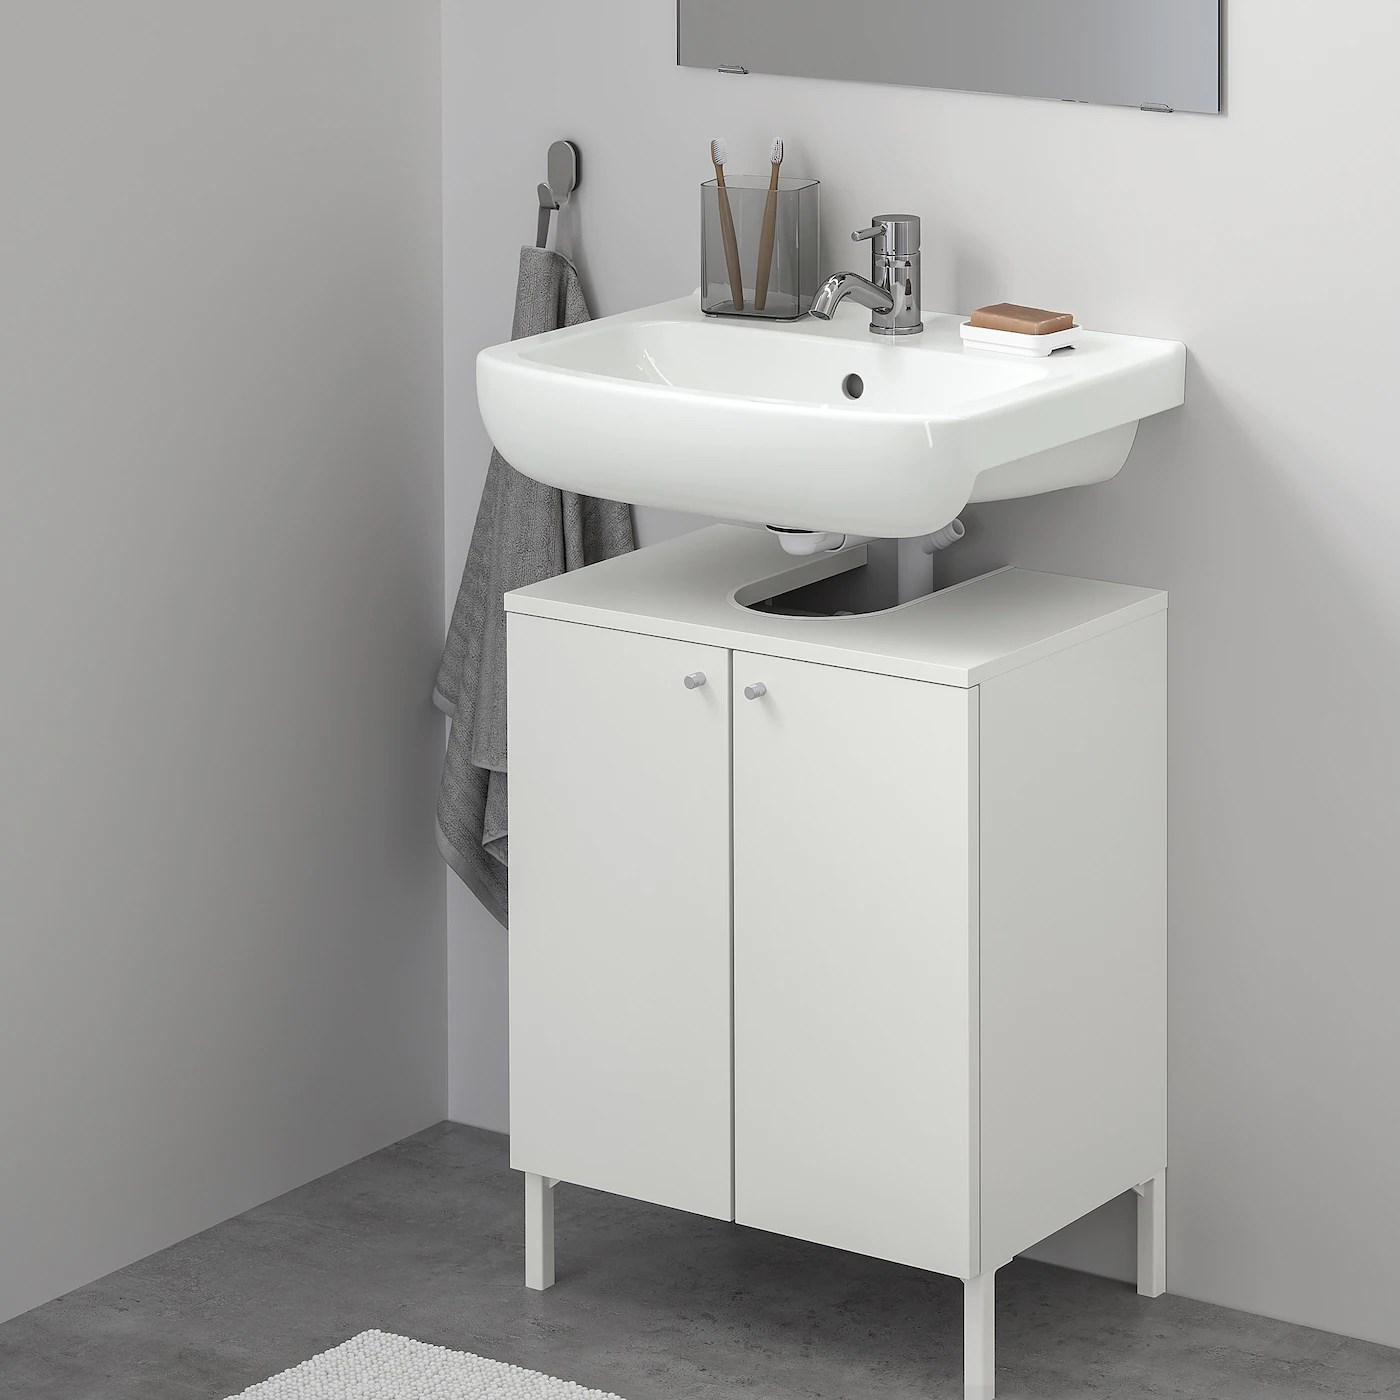 nysjon bjorkan sink base cabinet with 2 doors white pilkan faucet 21 1 4x31 1 2 54x80 cm